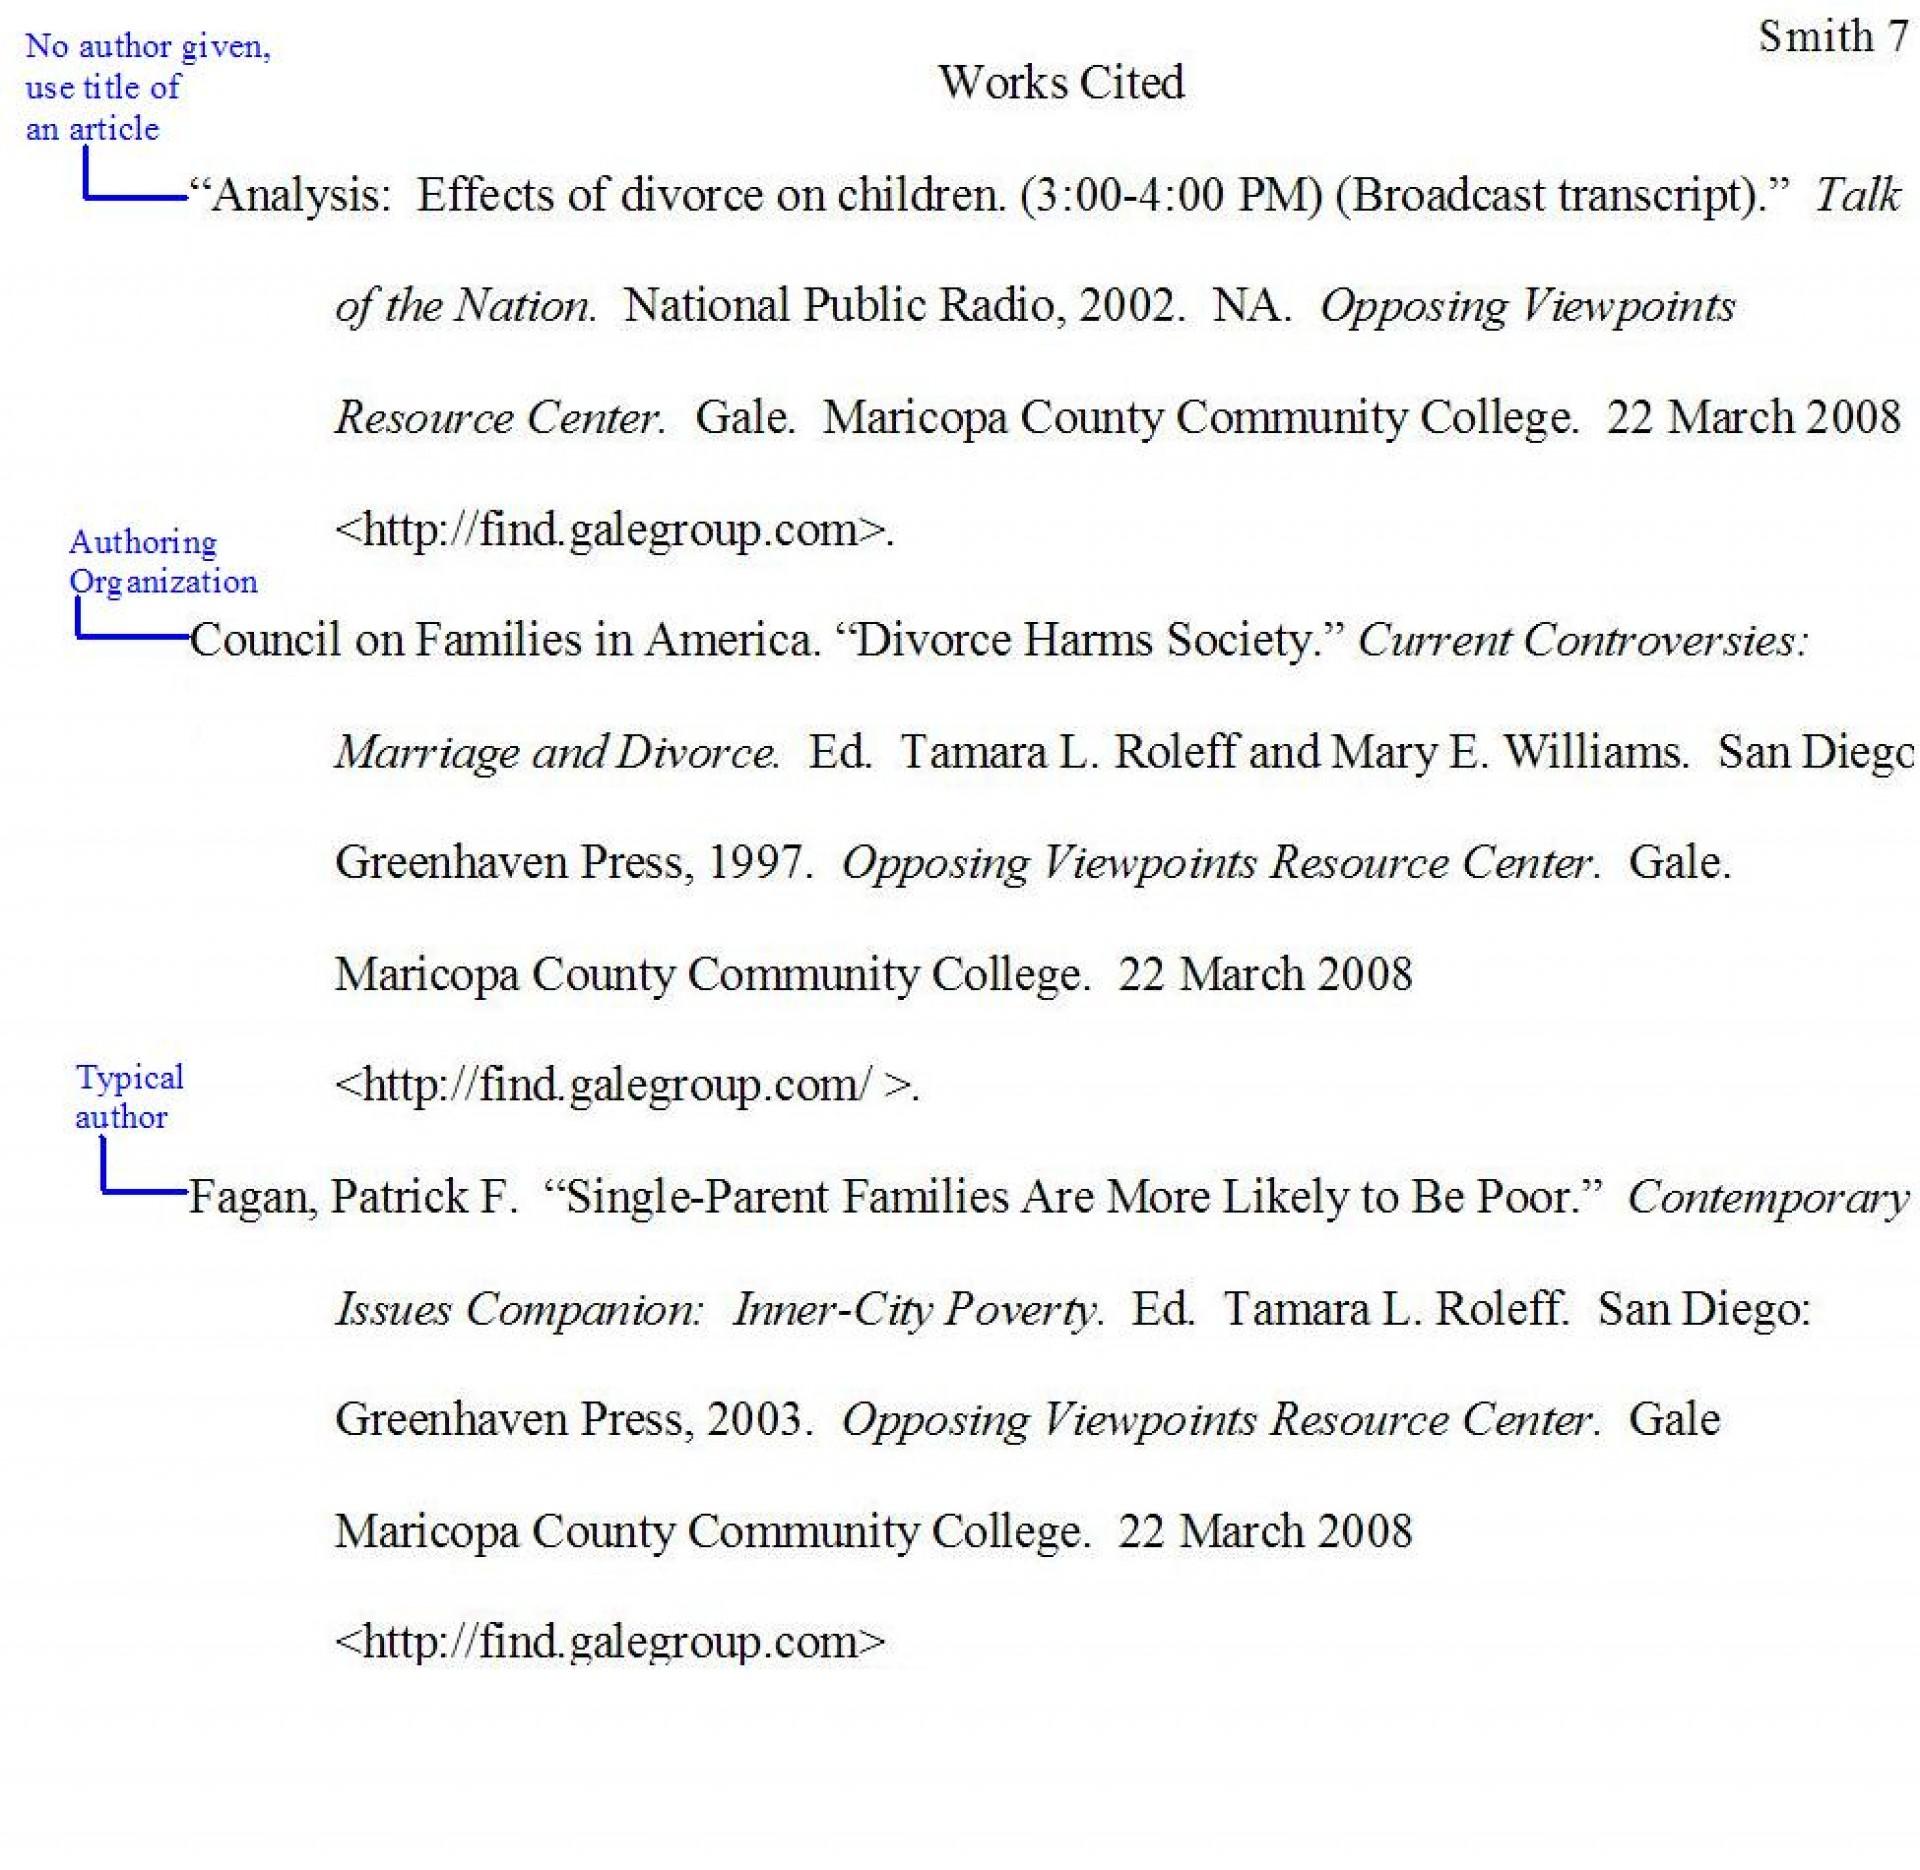 016 Paragraph Essay Sample Samplewrkctd Jpg Stirring 5 Example High School Pdf Argumentative Outline Template Five 1920